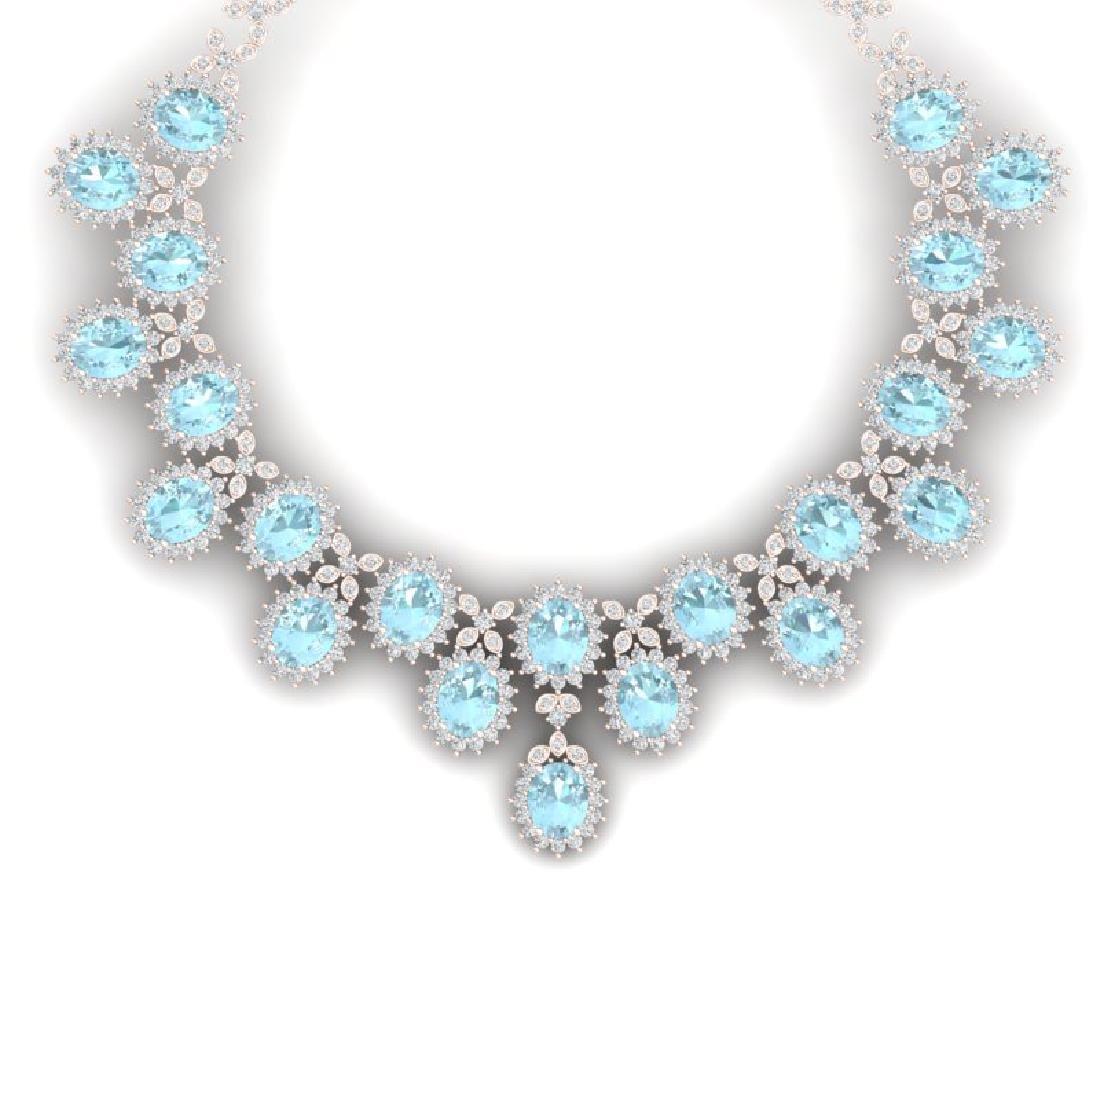 83 CTW Royalty Sky Topaz & VS Diamond Necklace 18K Rose